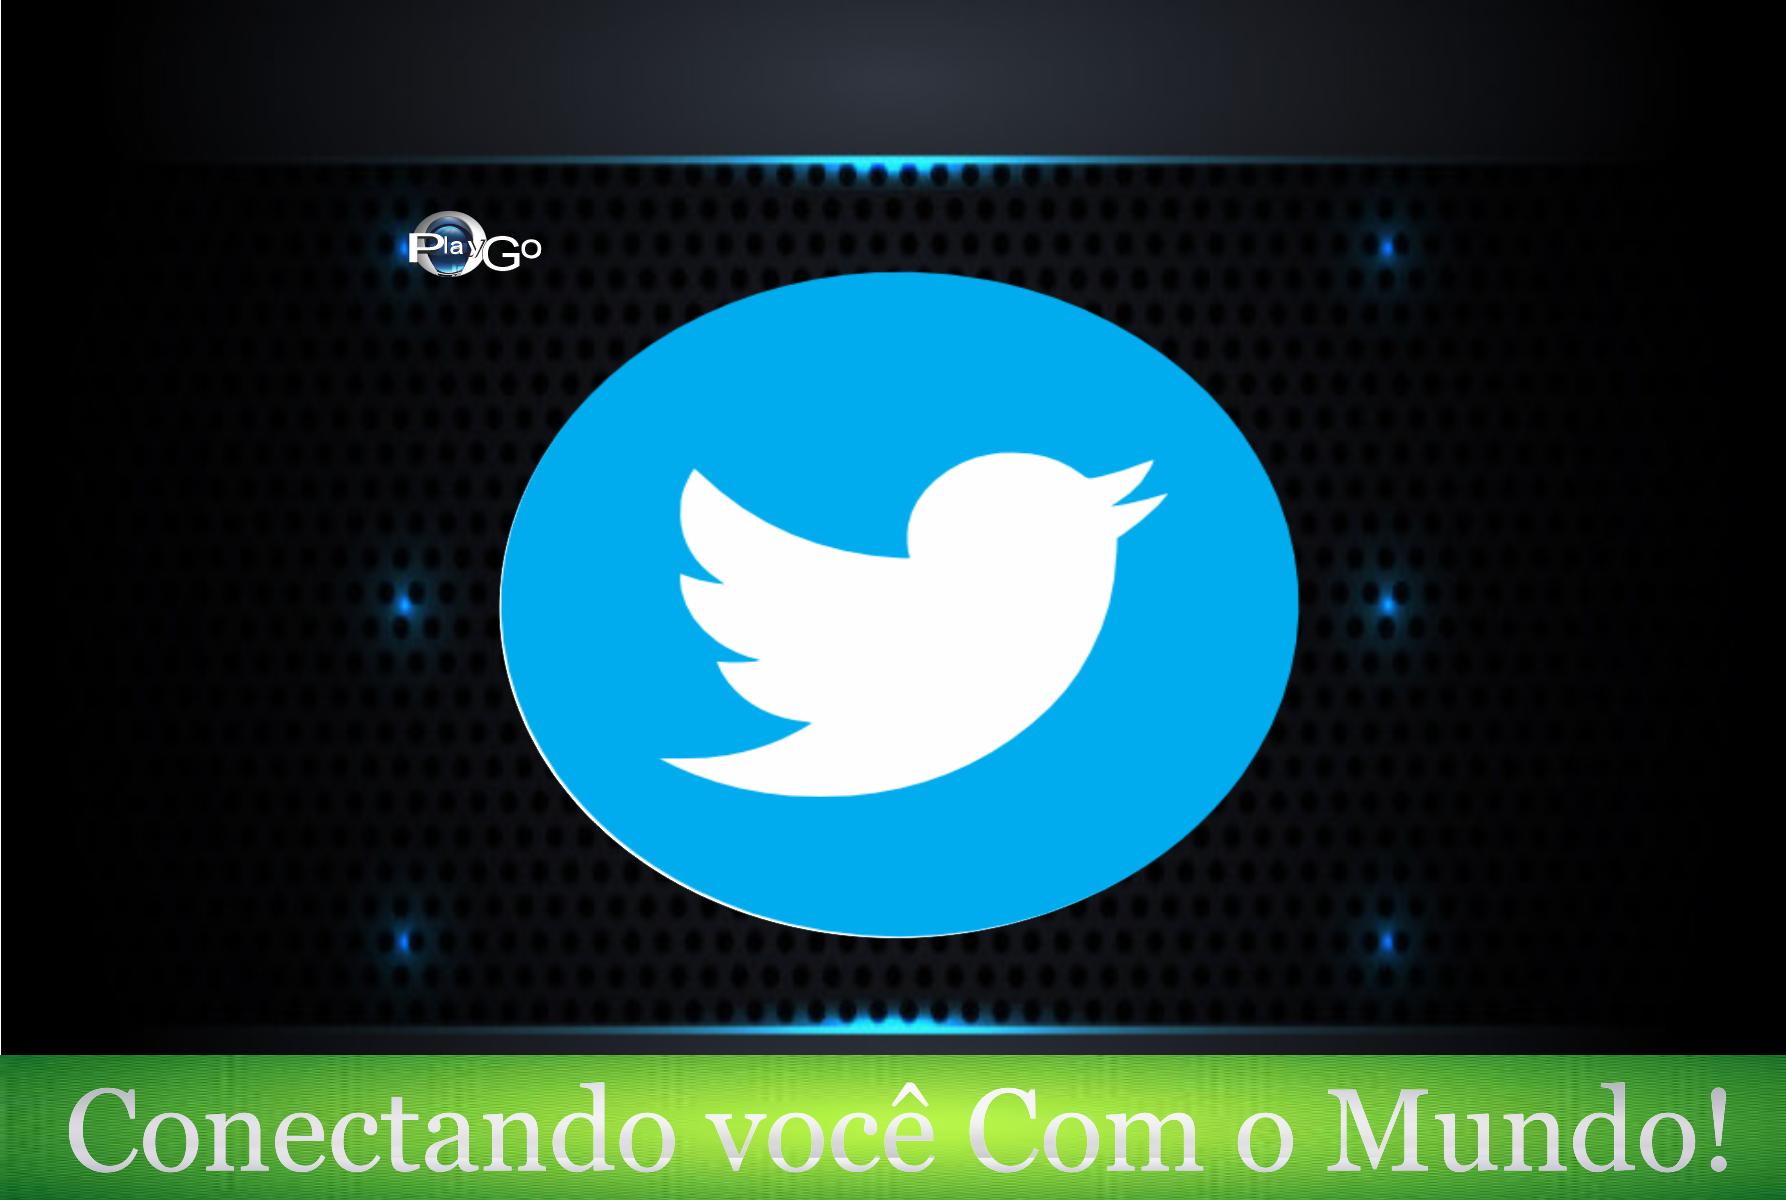 icons-social__item icons-social__item--twitter